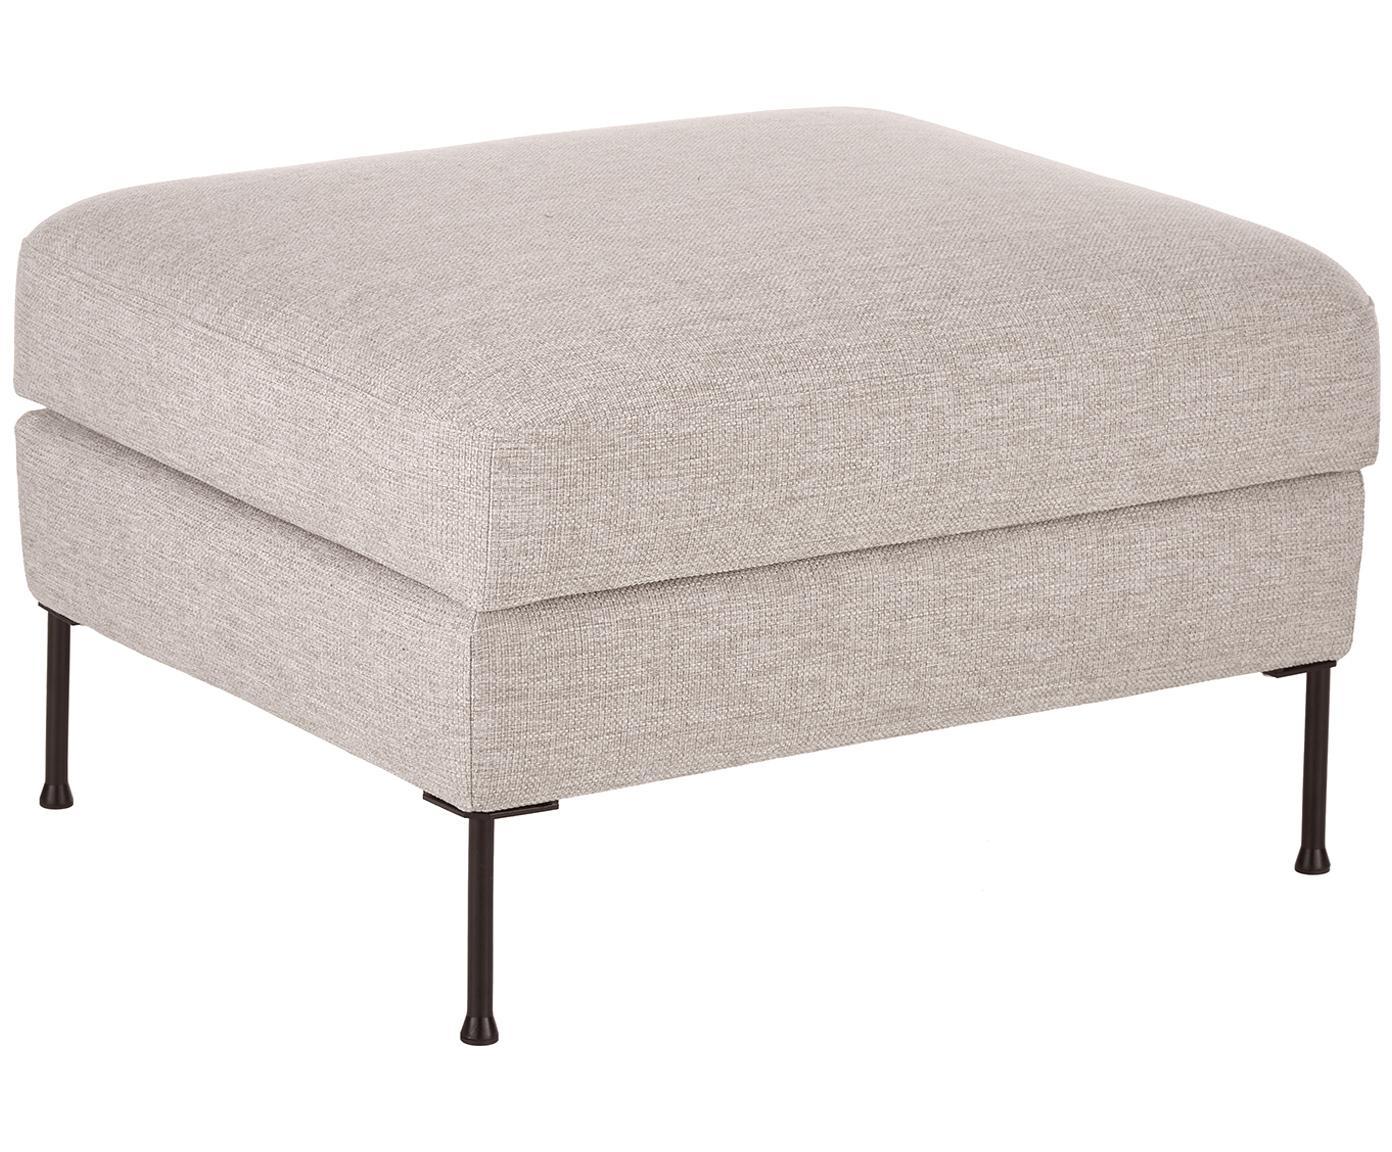 Reposapiés Cucita, con espacio de almacenamiento, Tapizado: tejido (poliéster) 100.00, Estructura: madera de pino macizo, Beige, An 85 x Al 42 cm